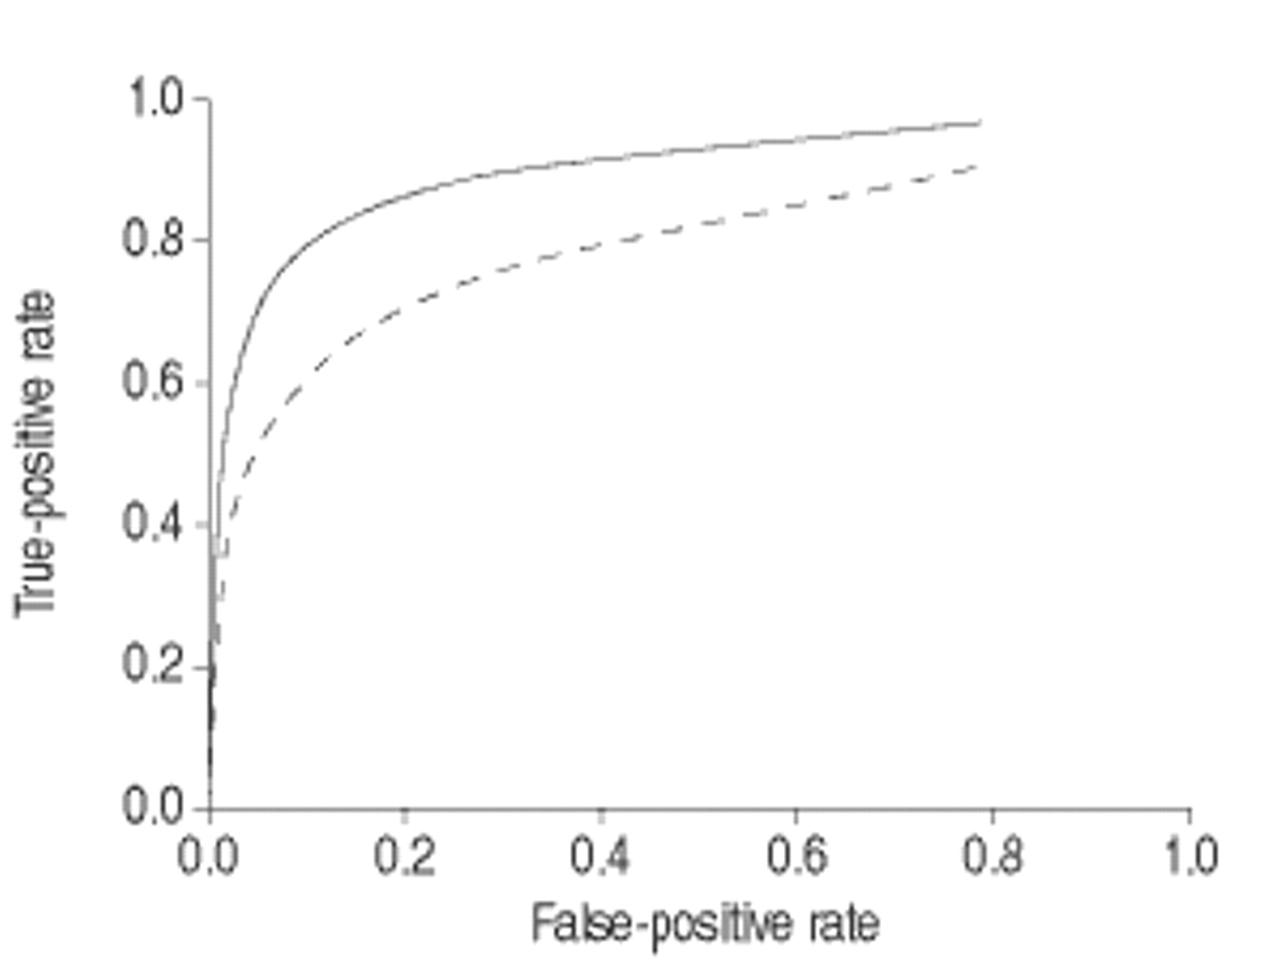 Meta-analysis of diagnostic procedures for Pneumocystis